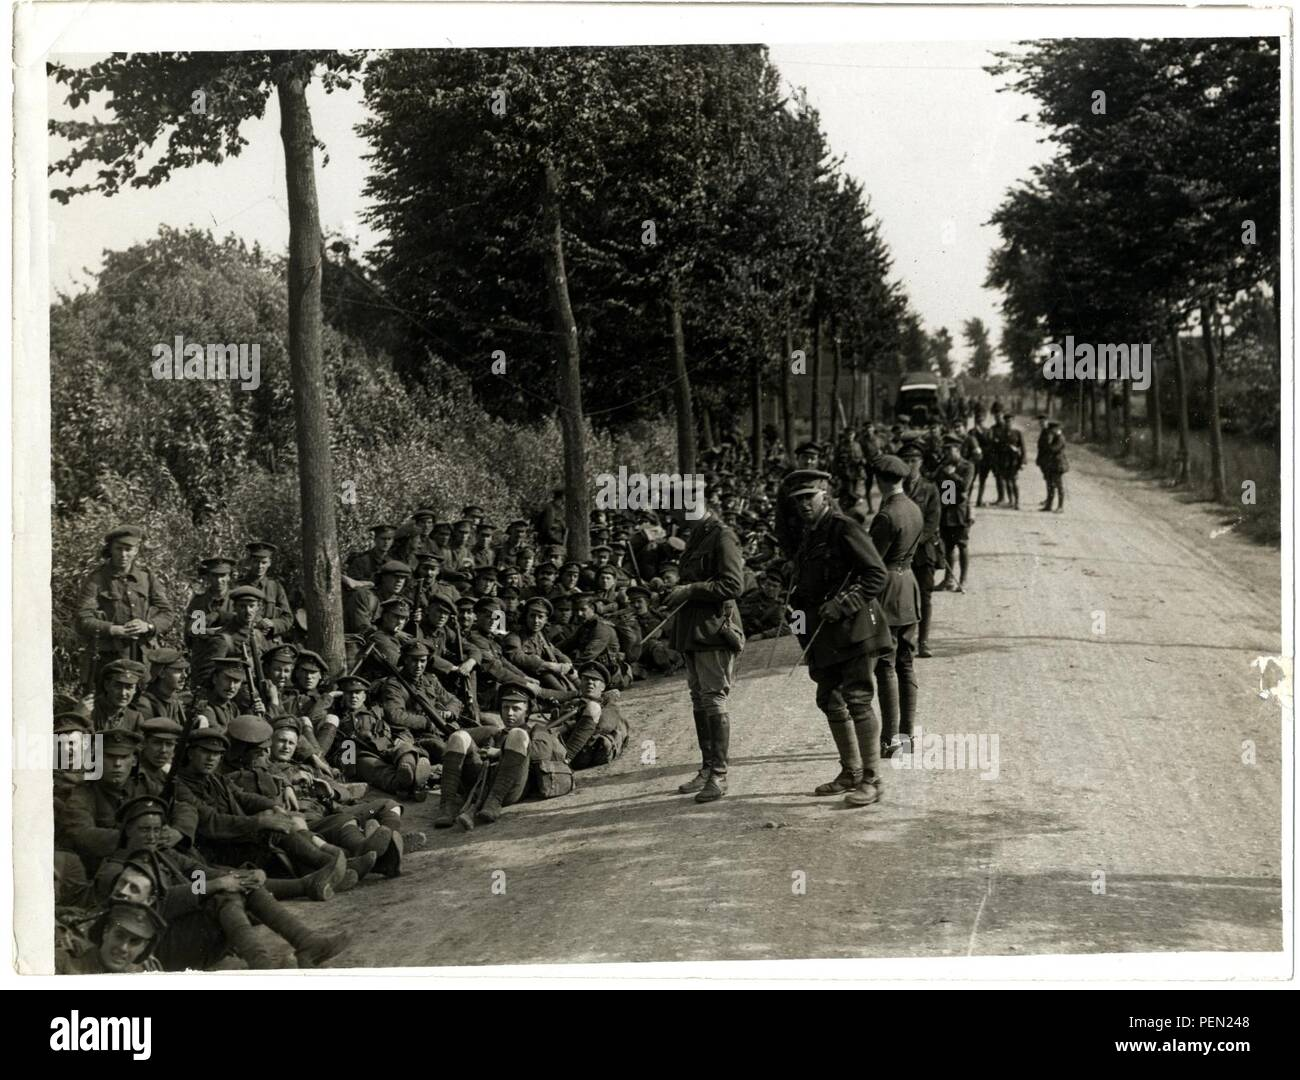 London Territorials resting on the march [Estaires La Bass u00e9e Road, France]. Photographer  H. D. Girdwood. - Stock Image